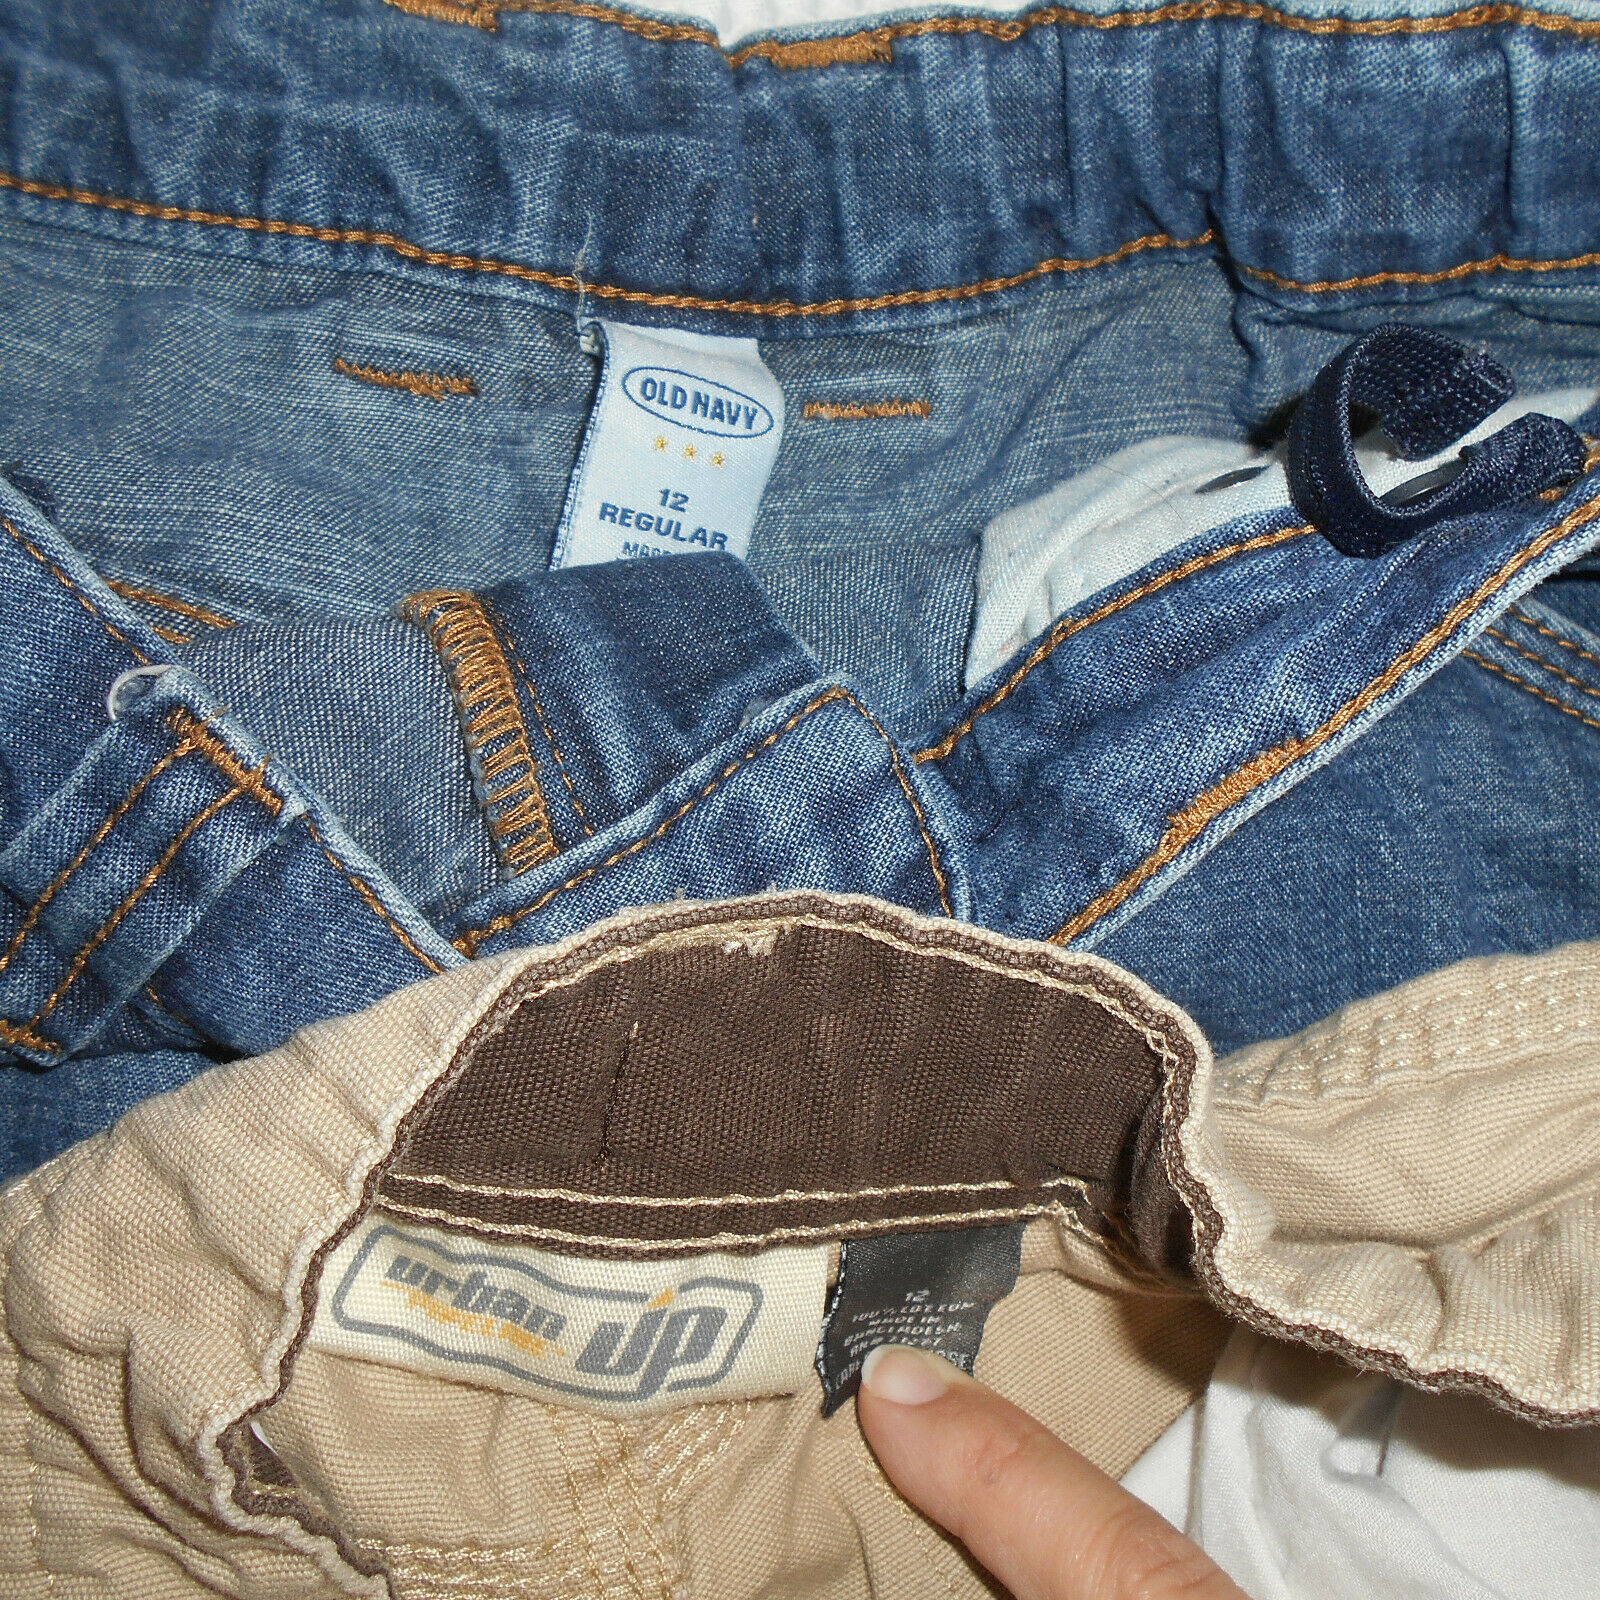 NWT OLD NAVY KIDS BOYS SHORTS  CAMO CARGO SHORTS    pick size